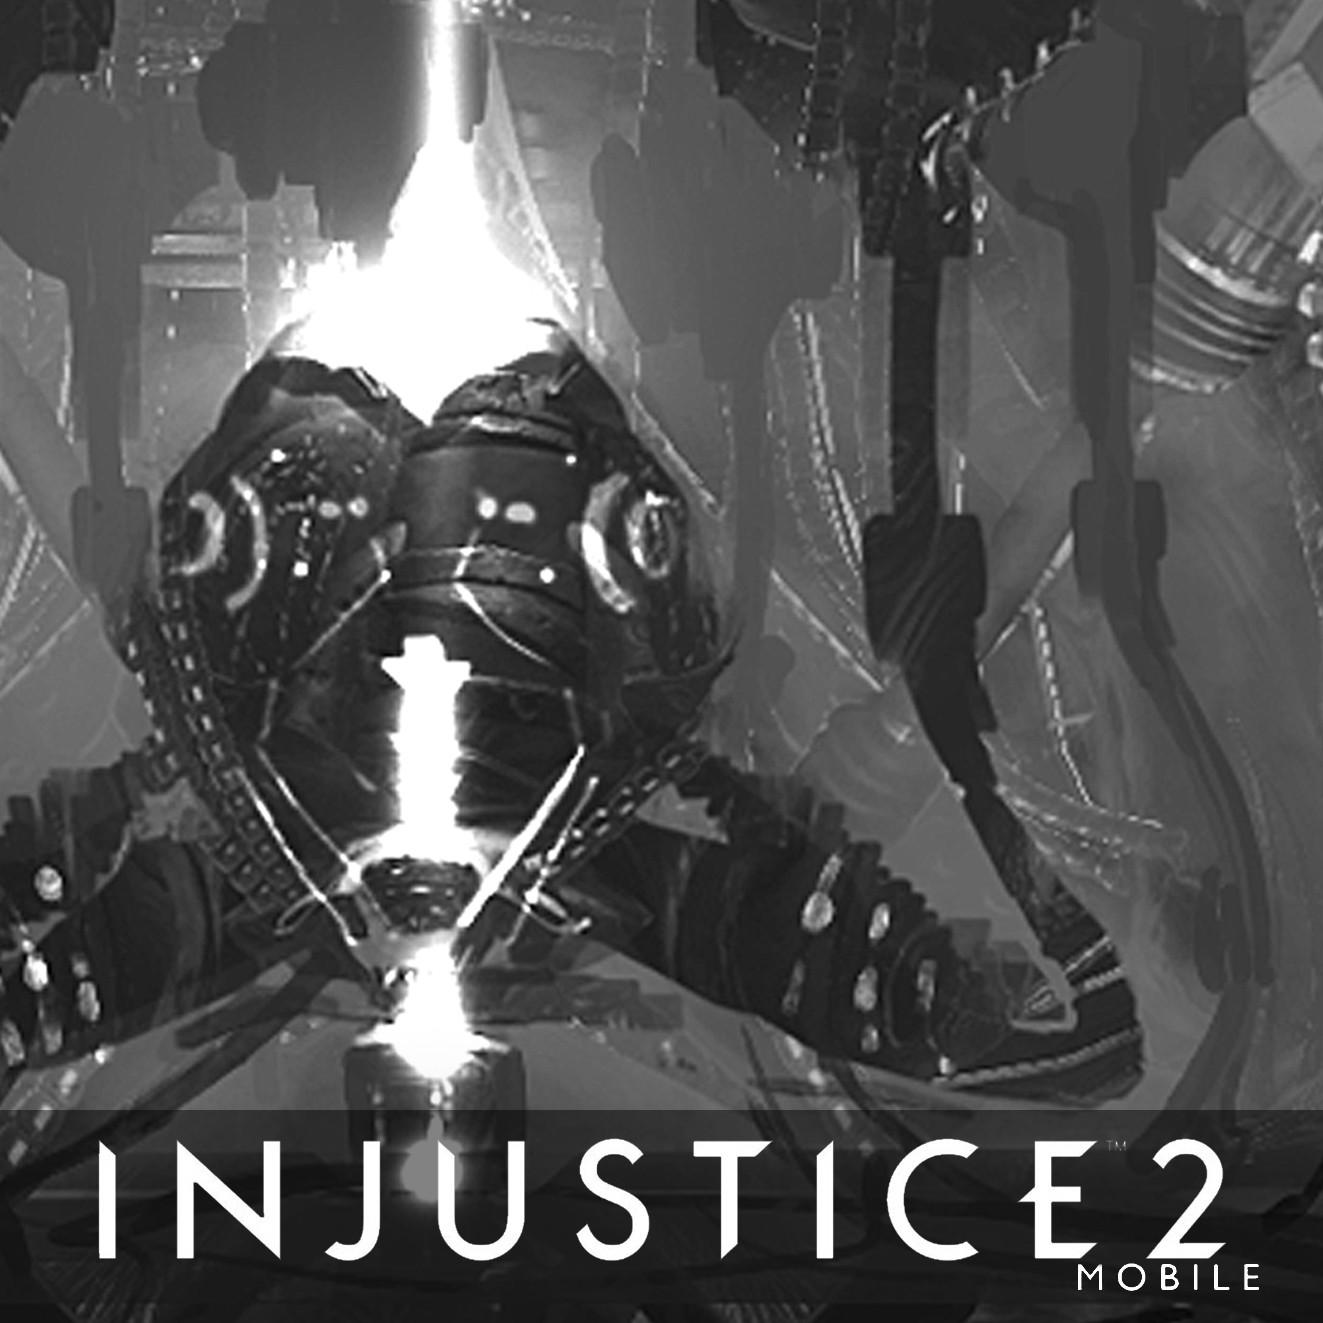 Injustice 2 // Reactor Room